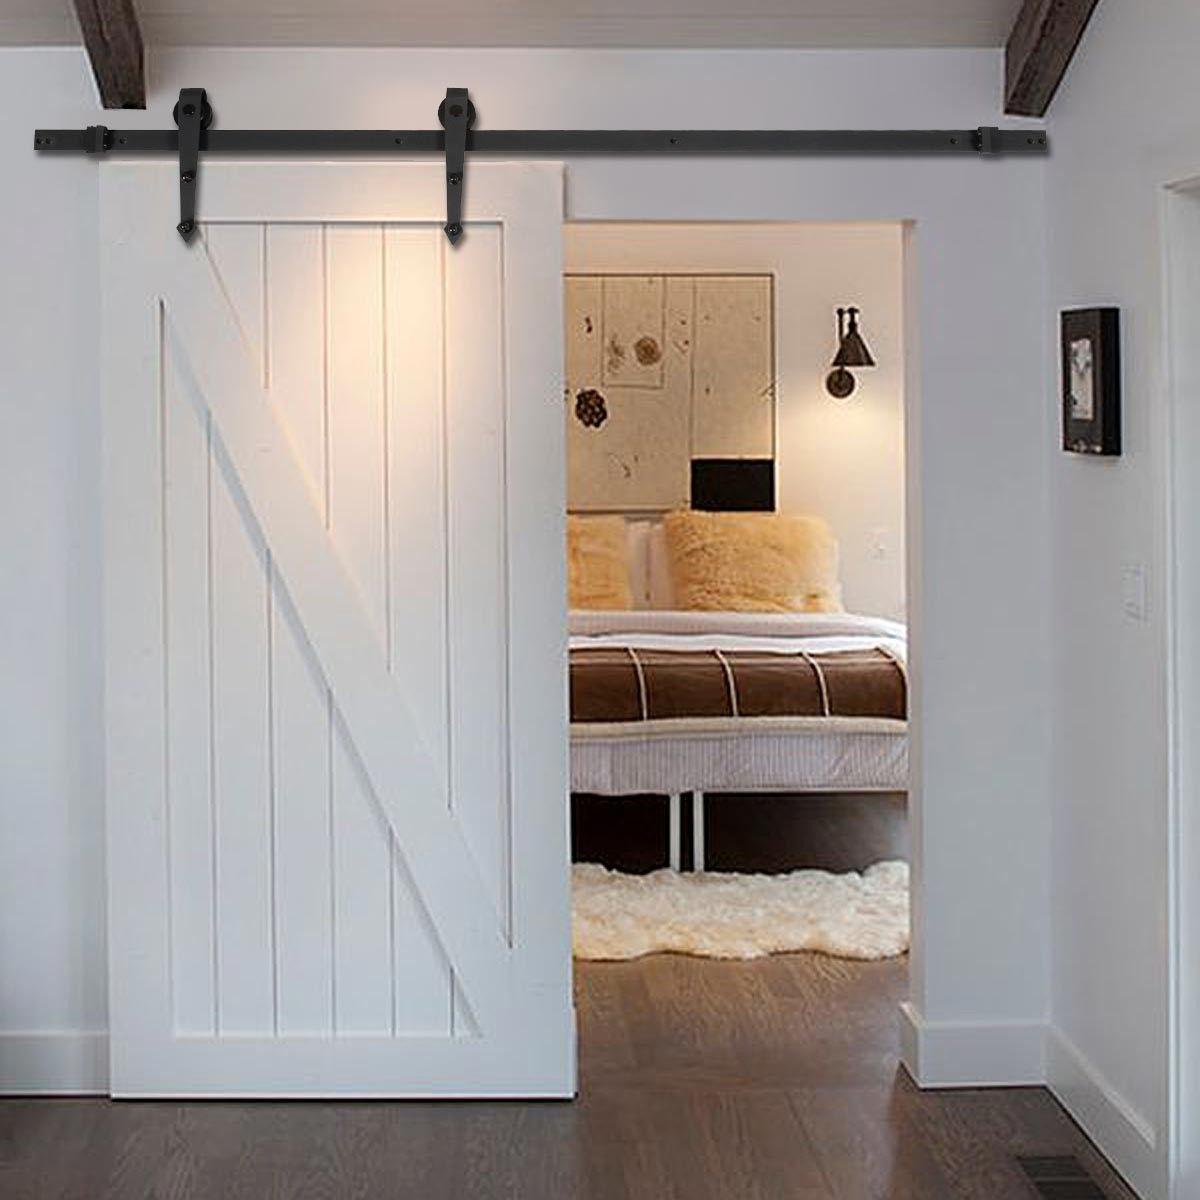 New ft black modern antique style sliding barn wood door hardware